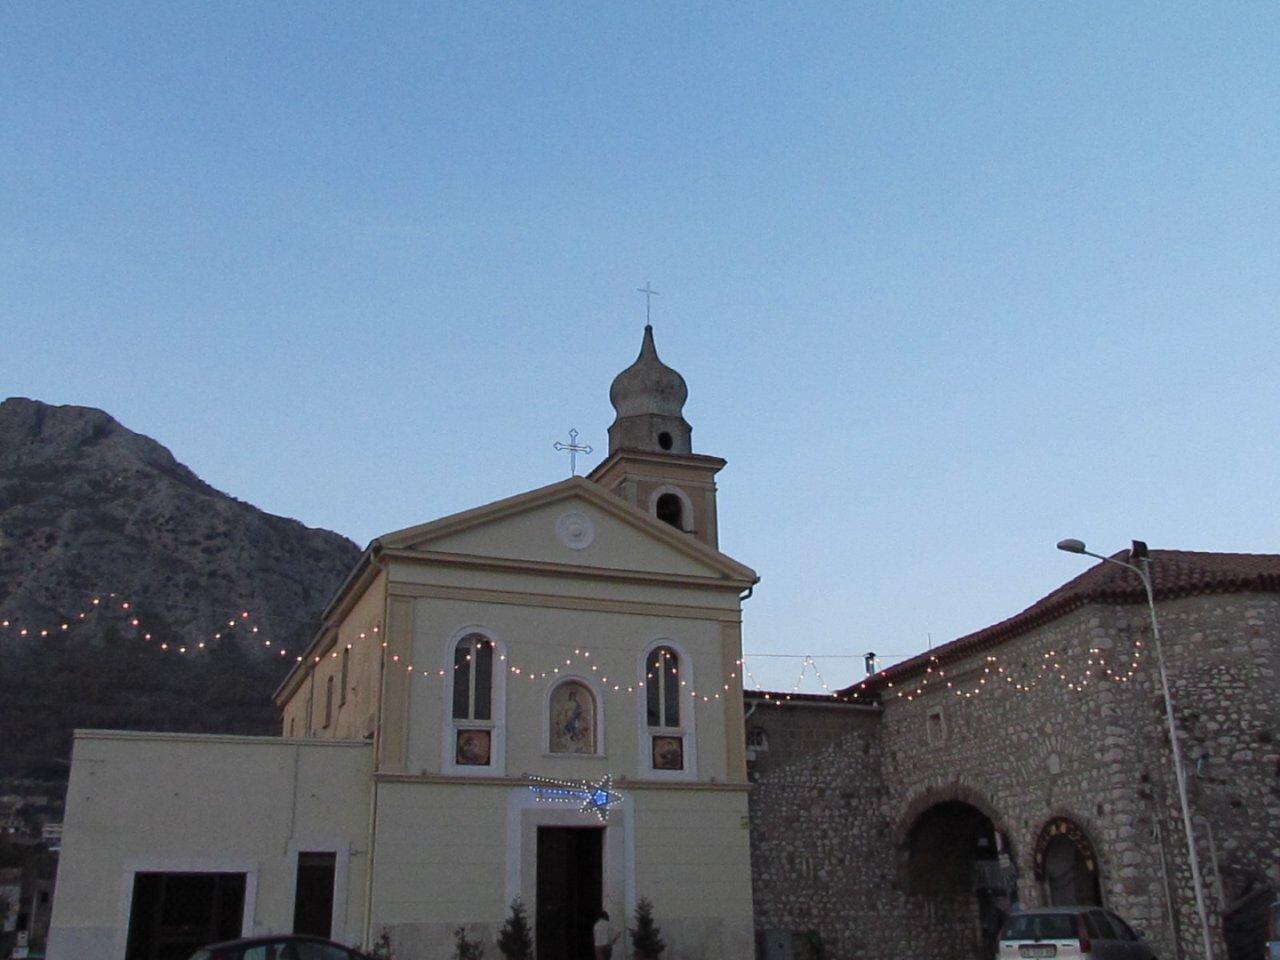 Montesarchio: Varoni in festa per la Vergine Addolorata